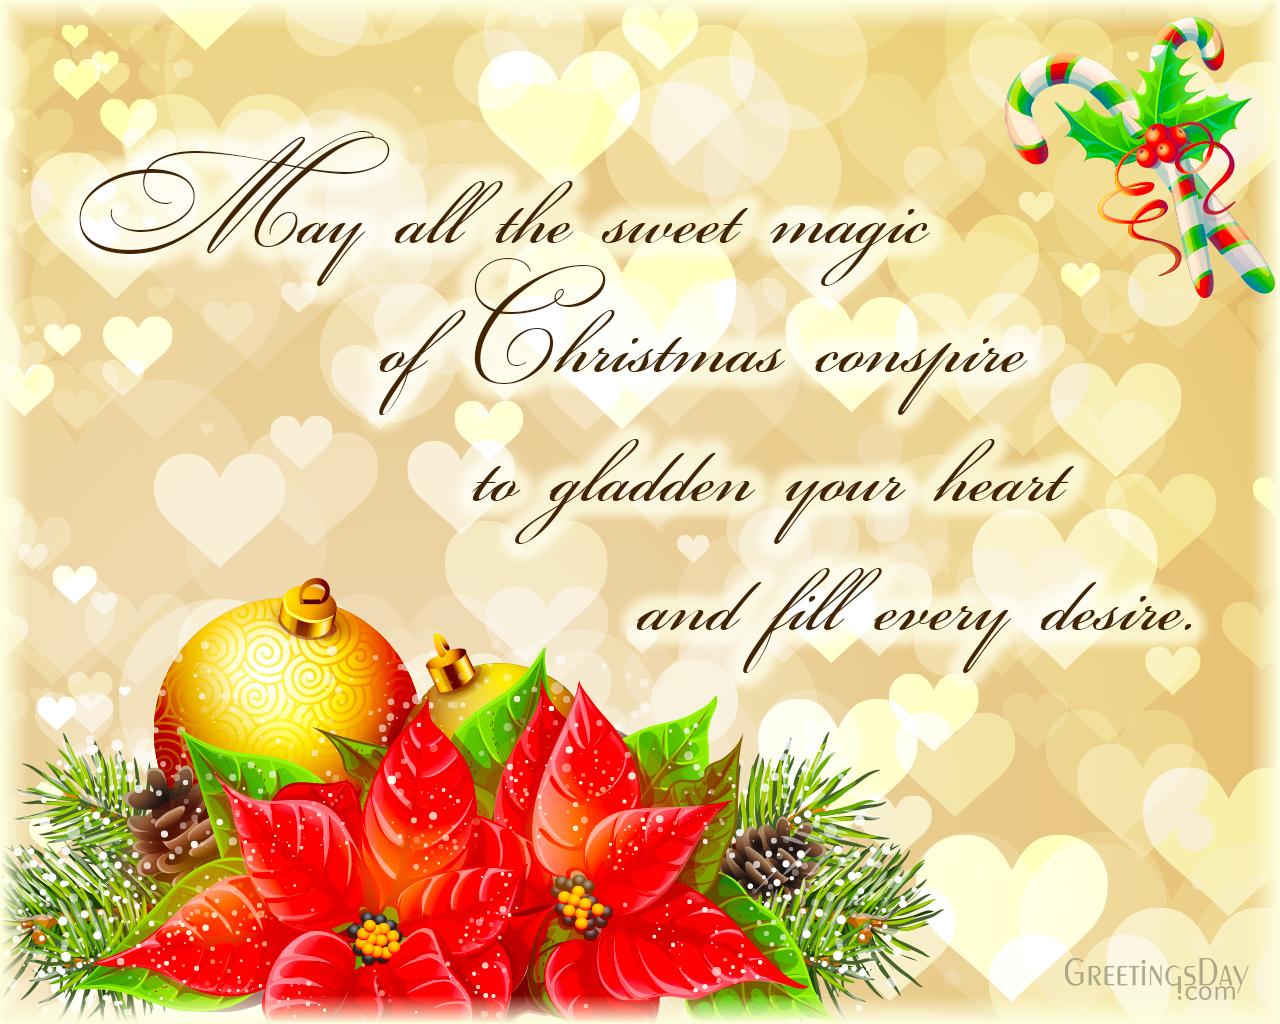 20 Christmas Greeting Cards For Boyfriend, Girlfriend